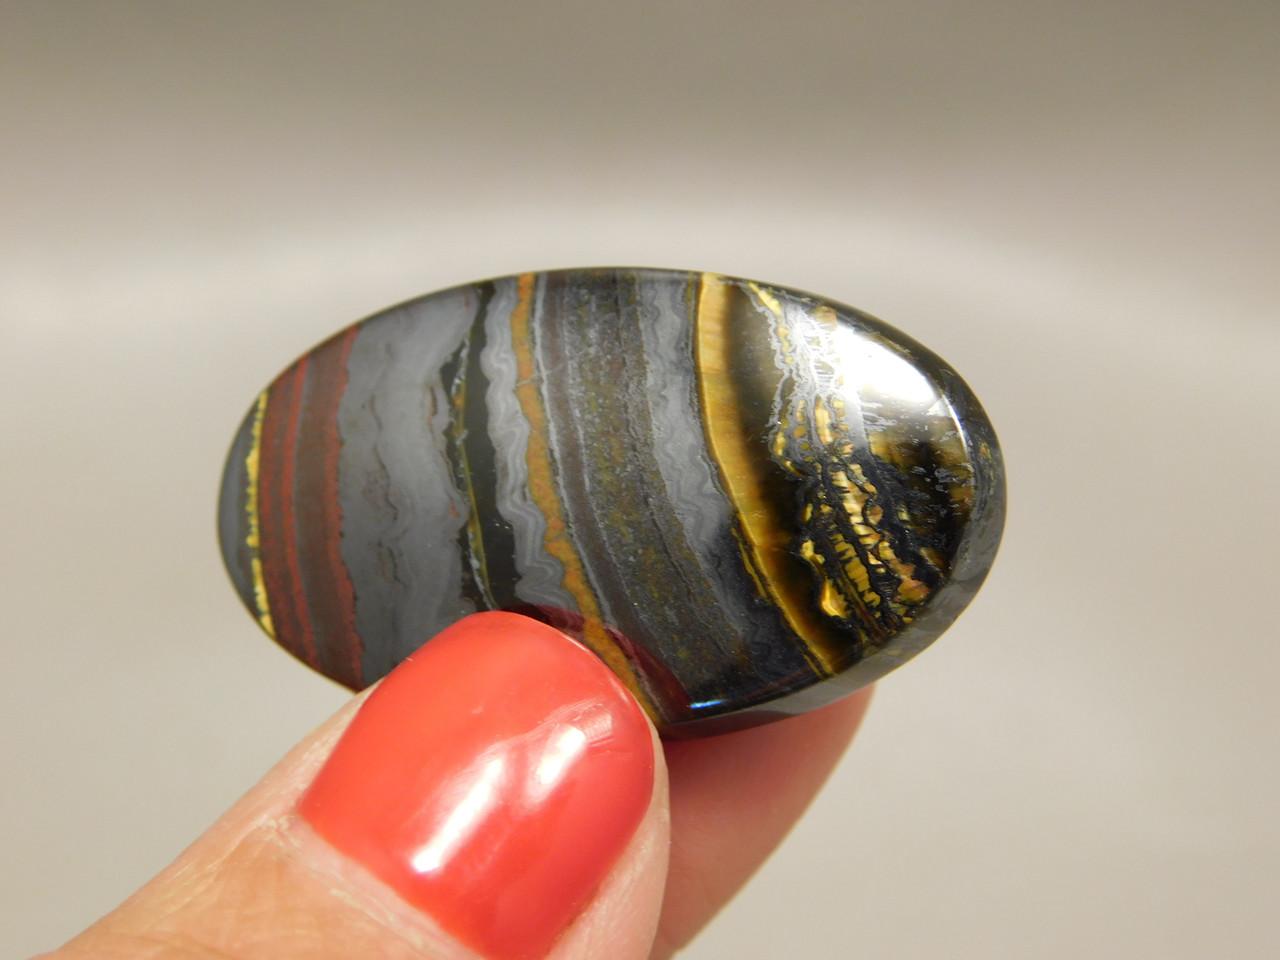 Tiger Iron Stone Cabochon Jewelry Making Supplies #20